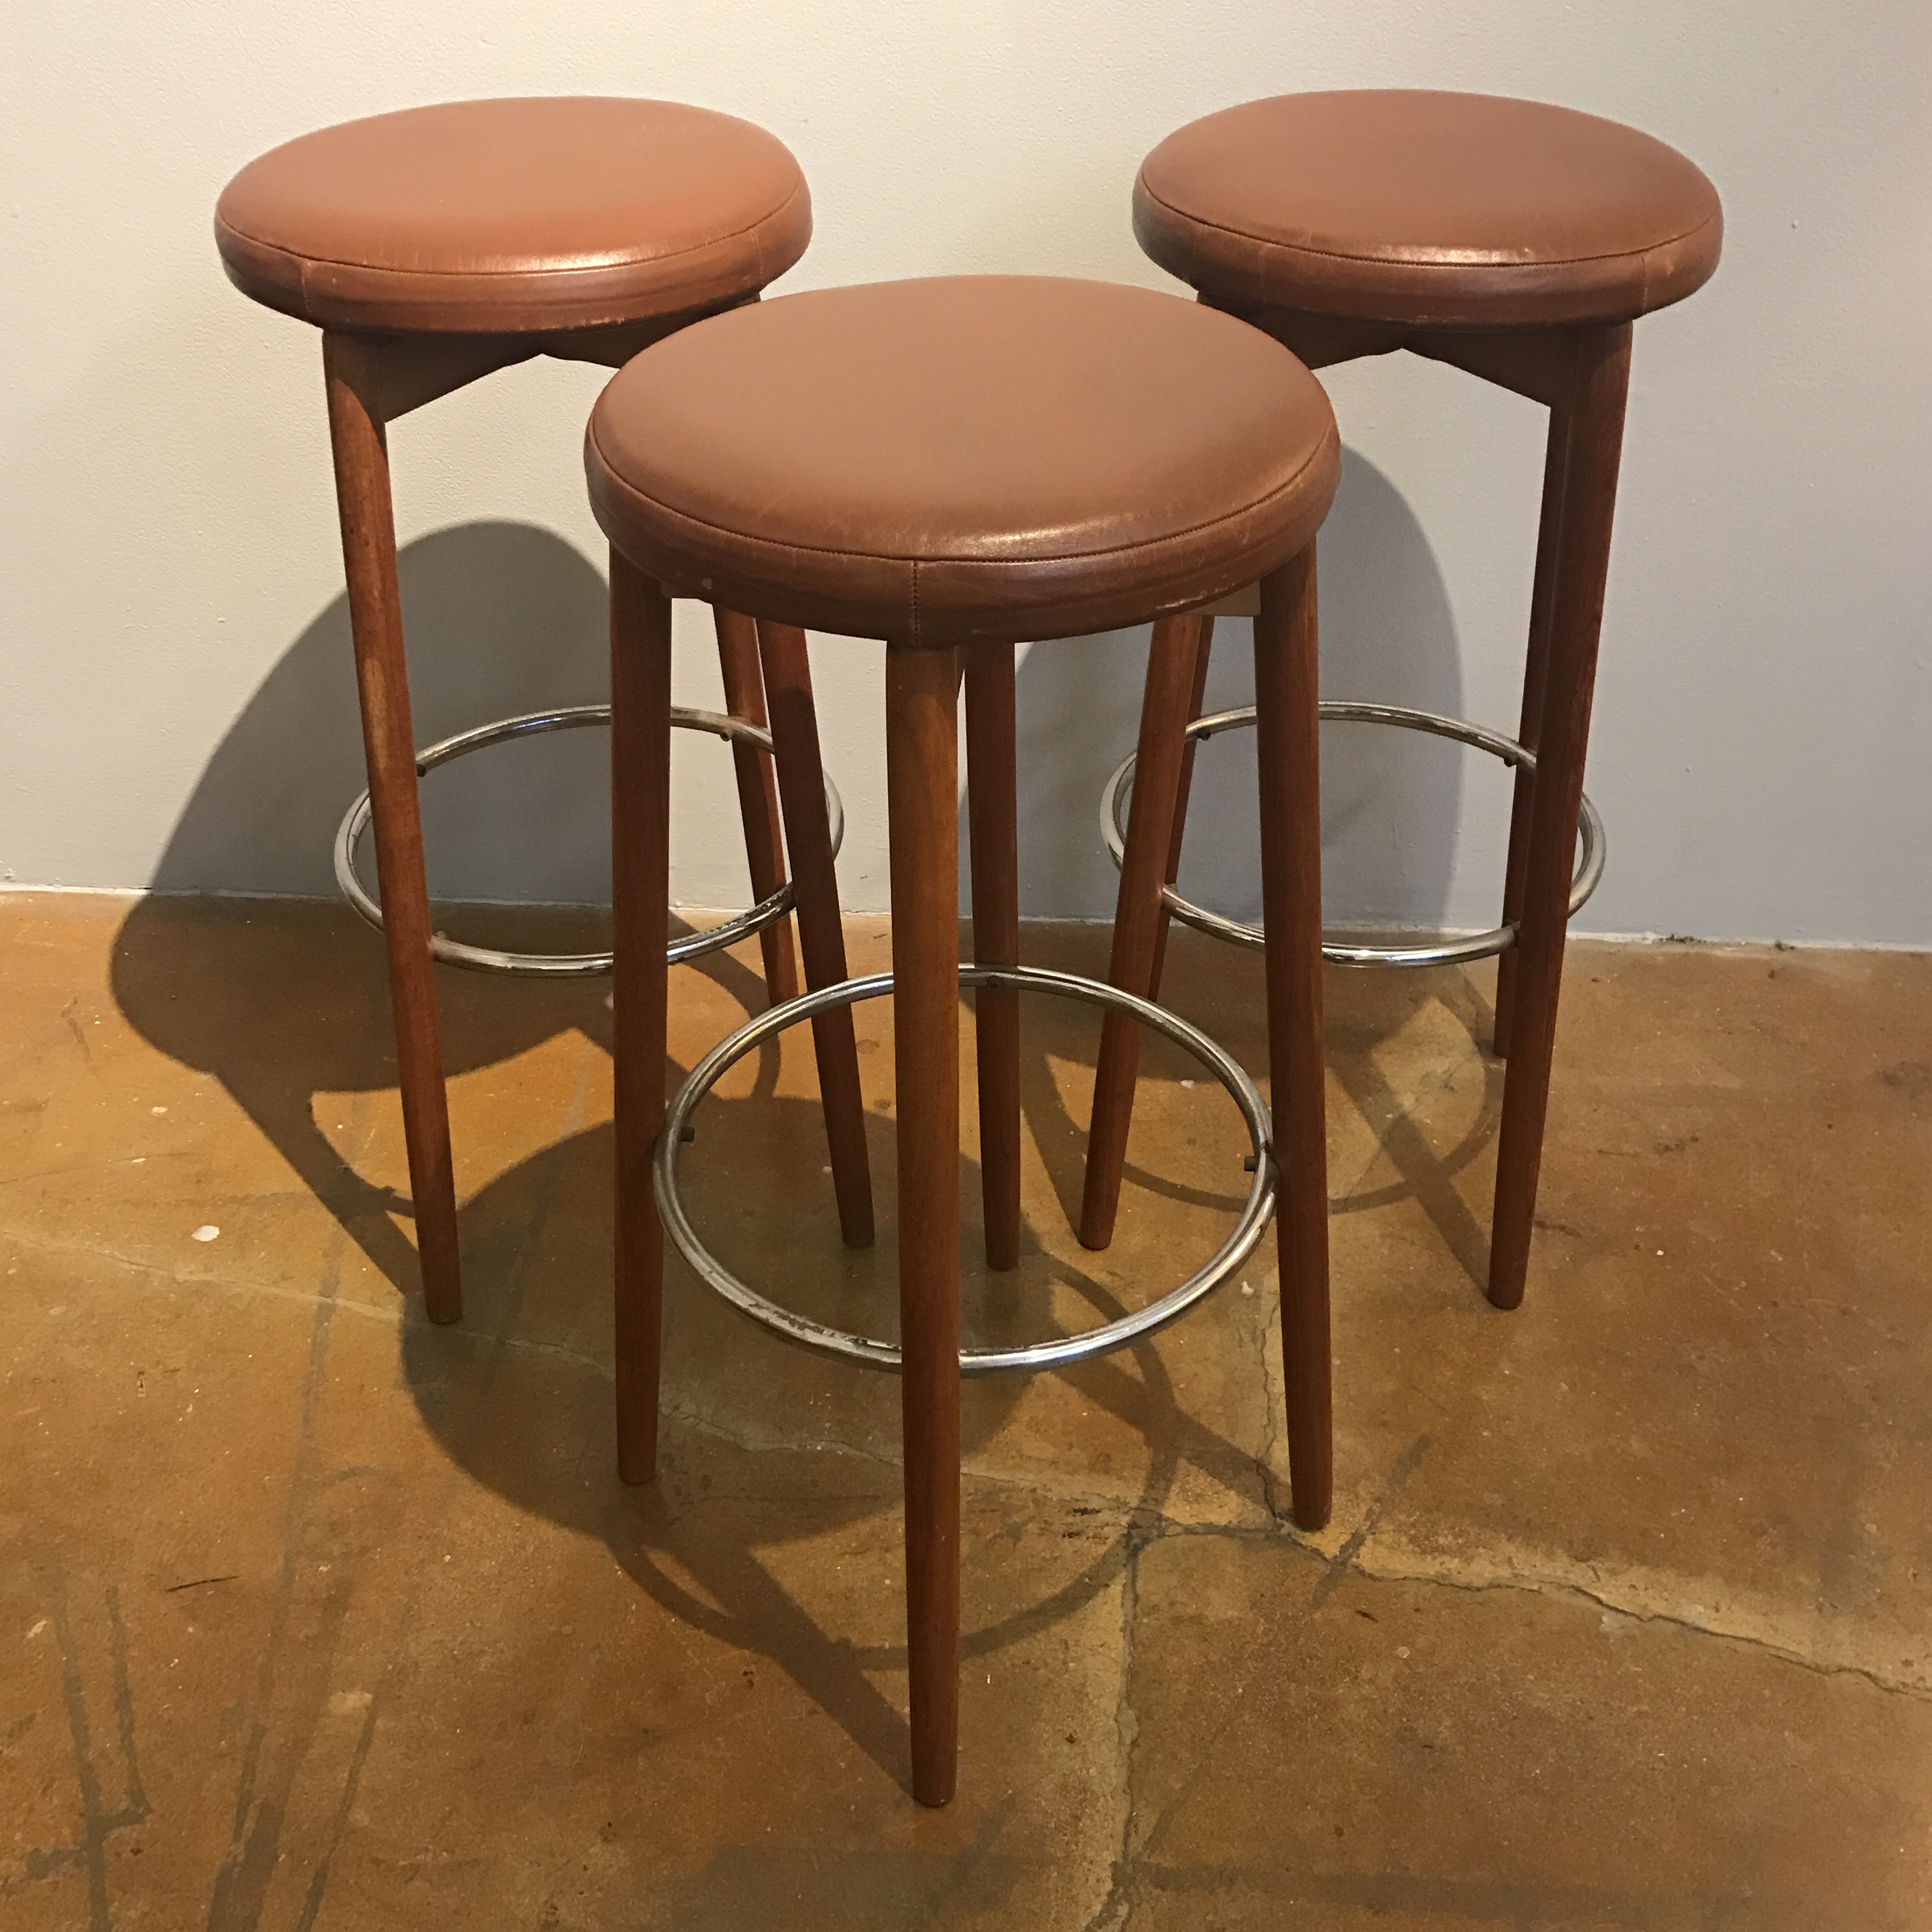 Danish Teak Amp Leather Bar Stools Set Of 3 Chairish